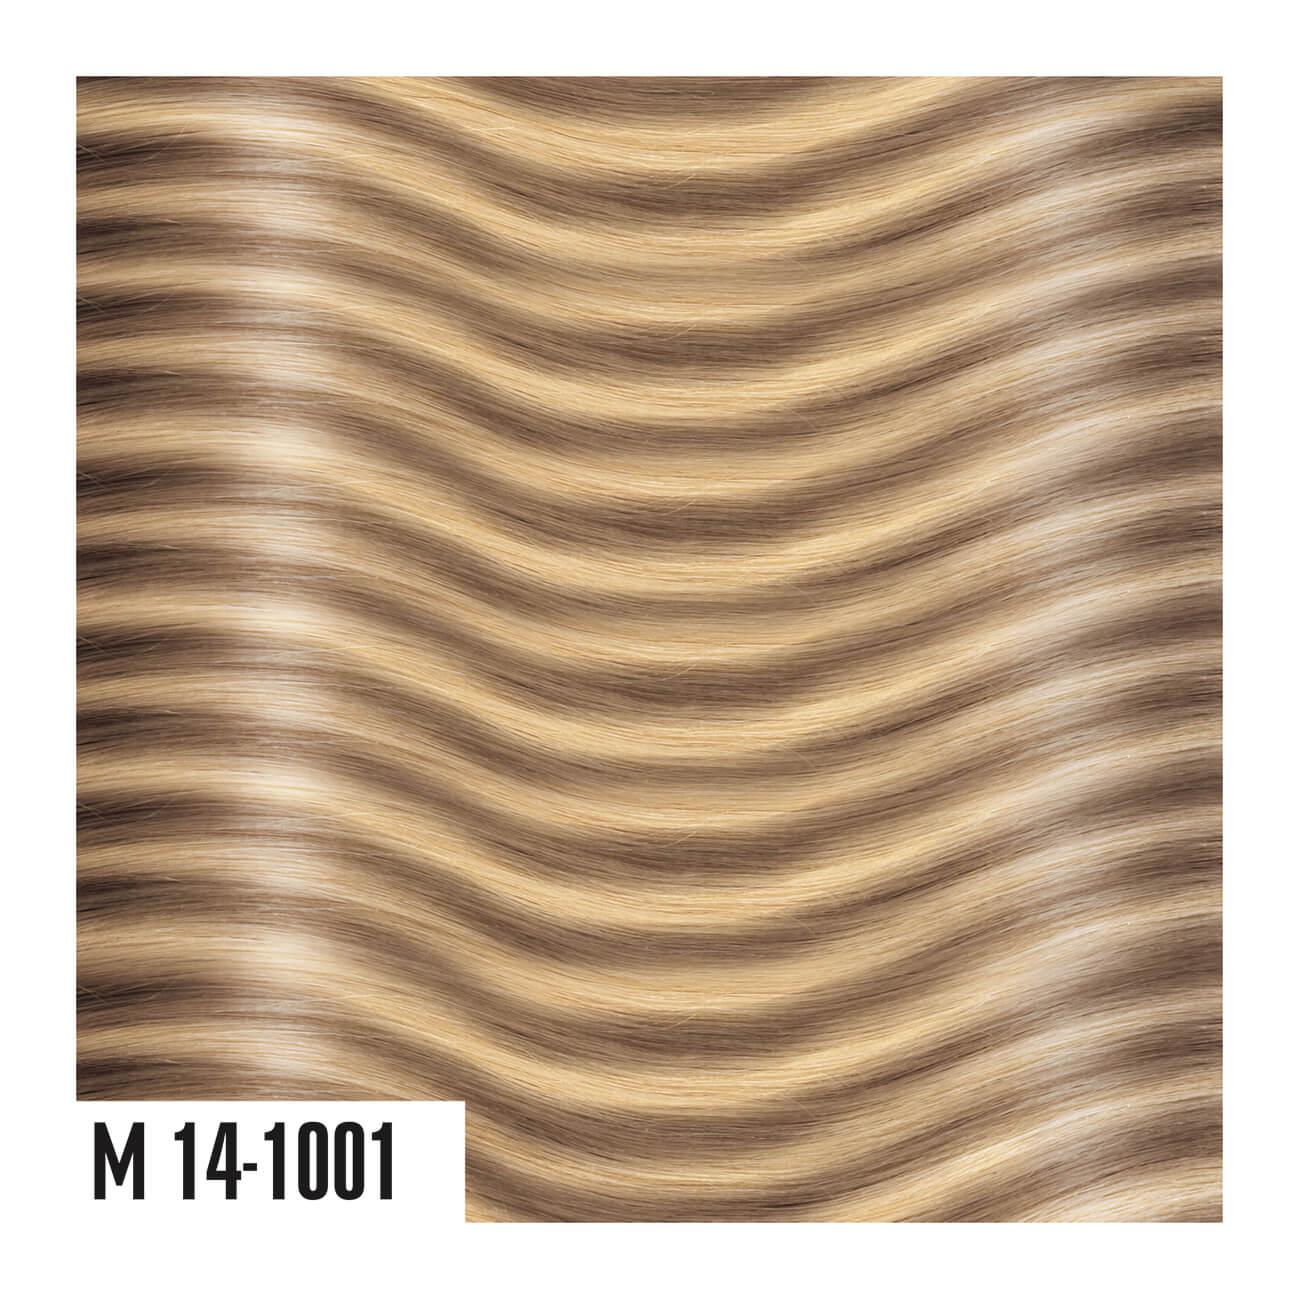 M14-1001